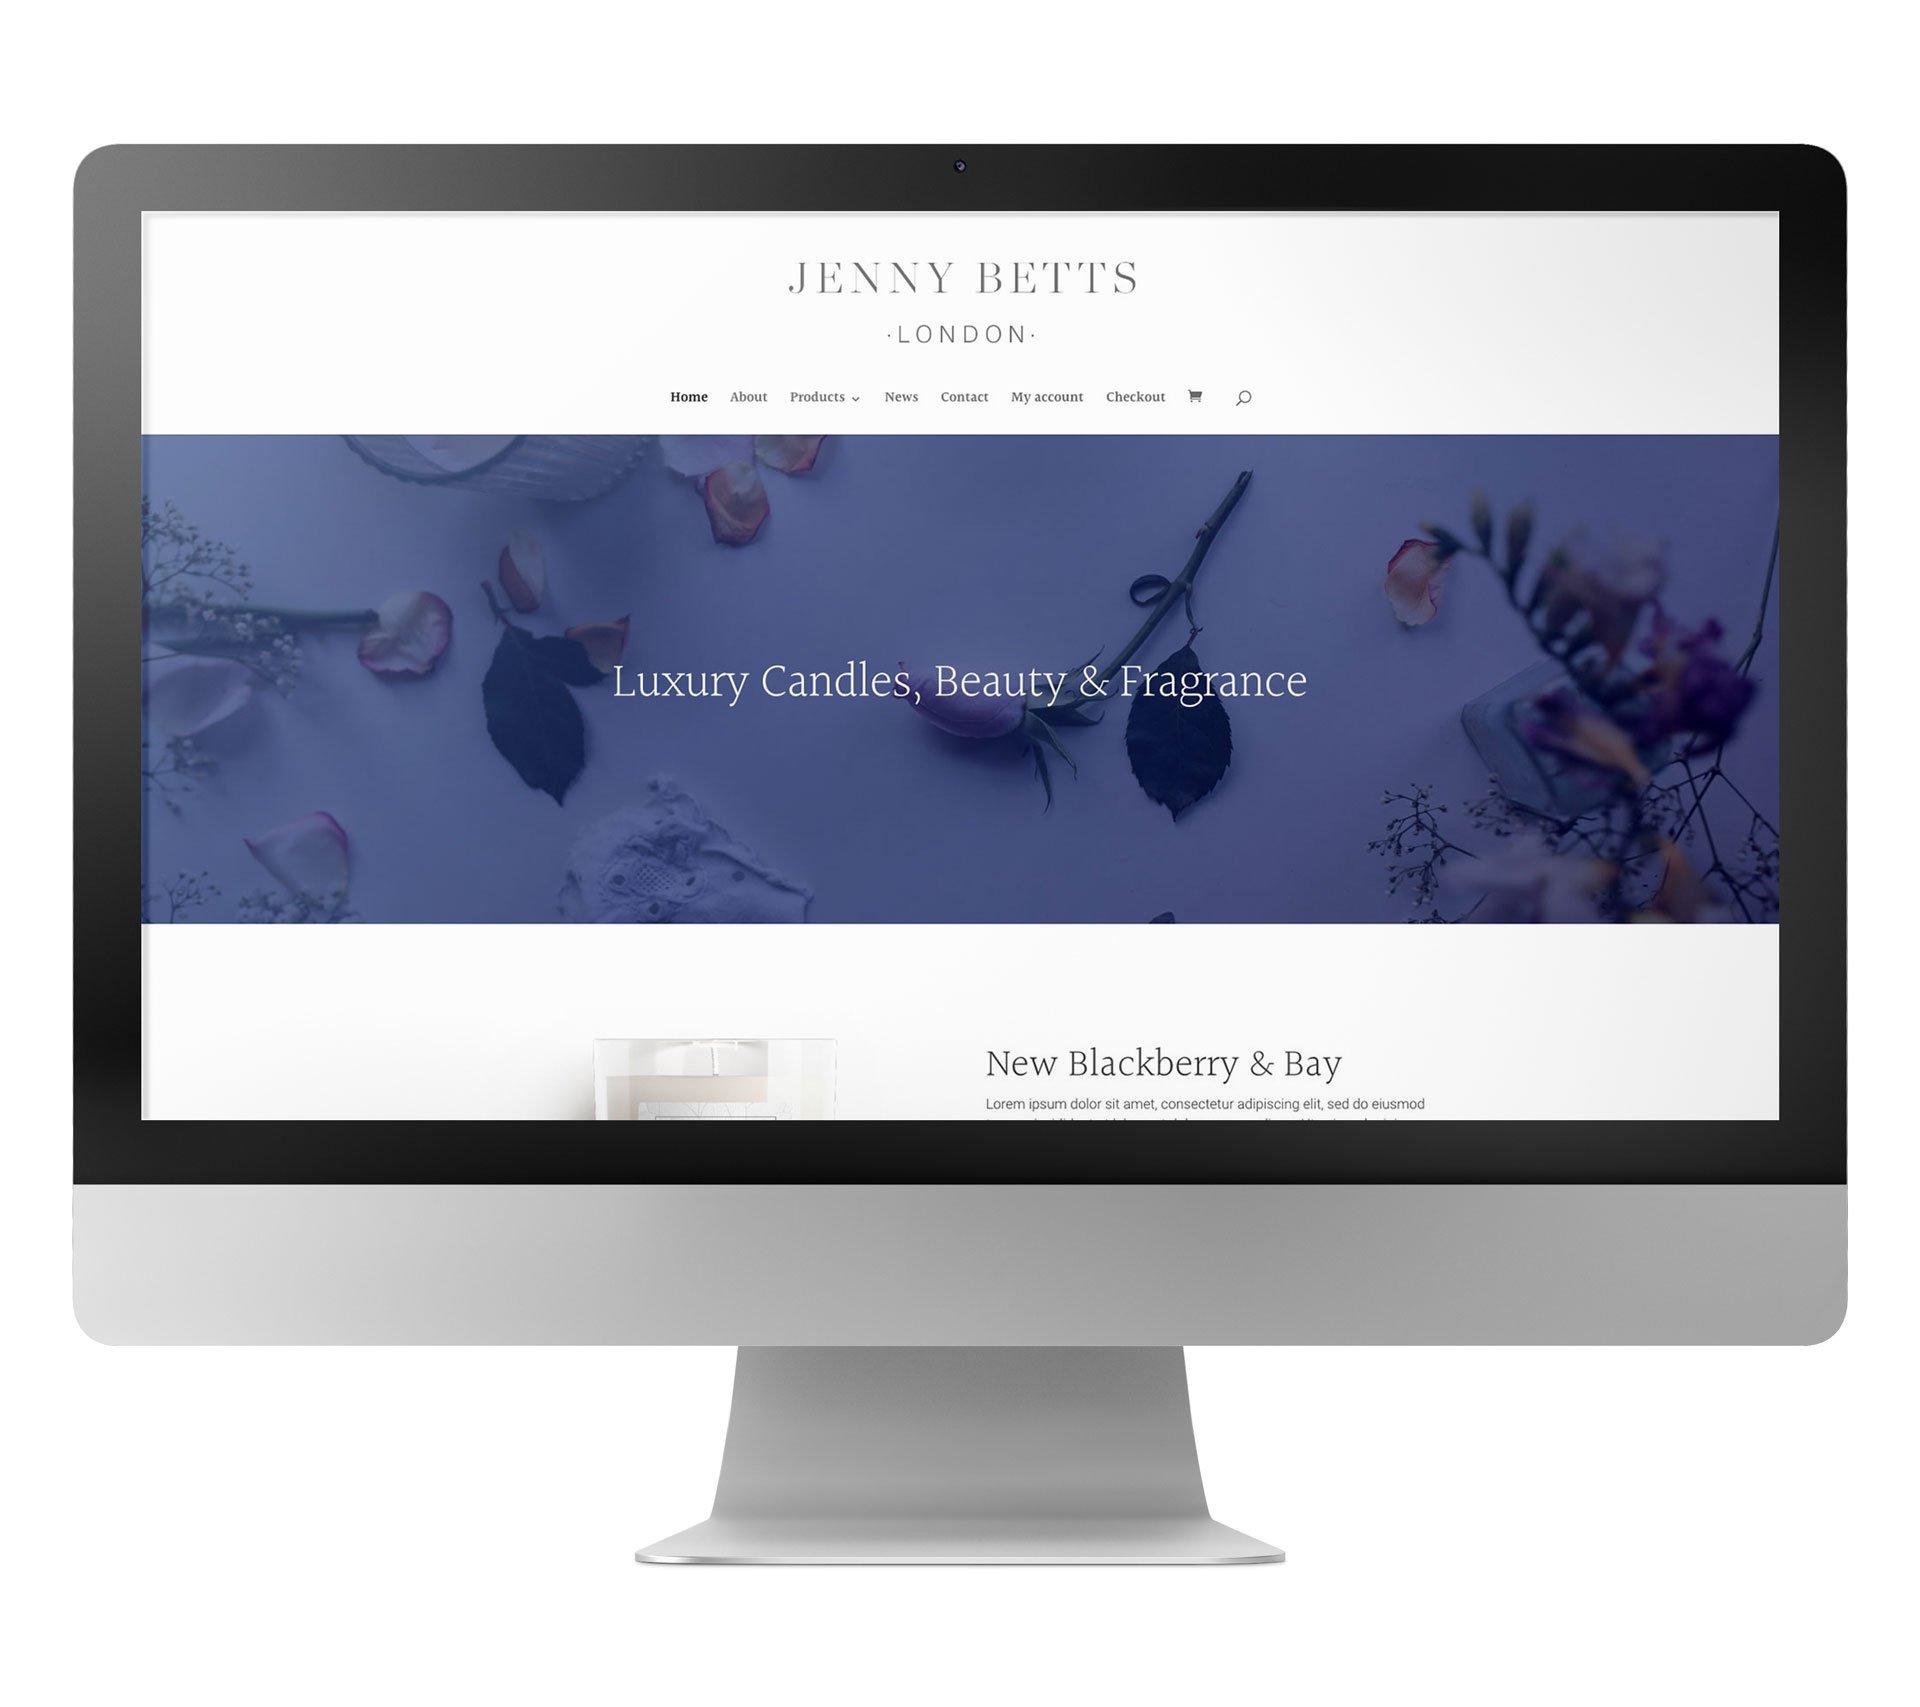 Jenny Betts website design